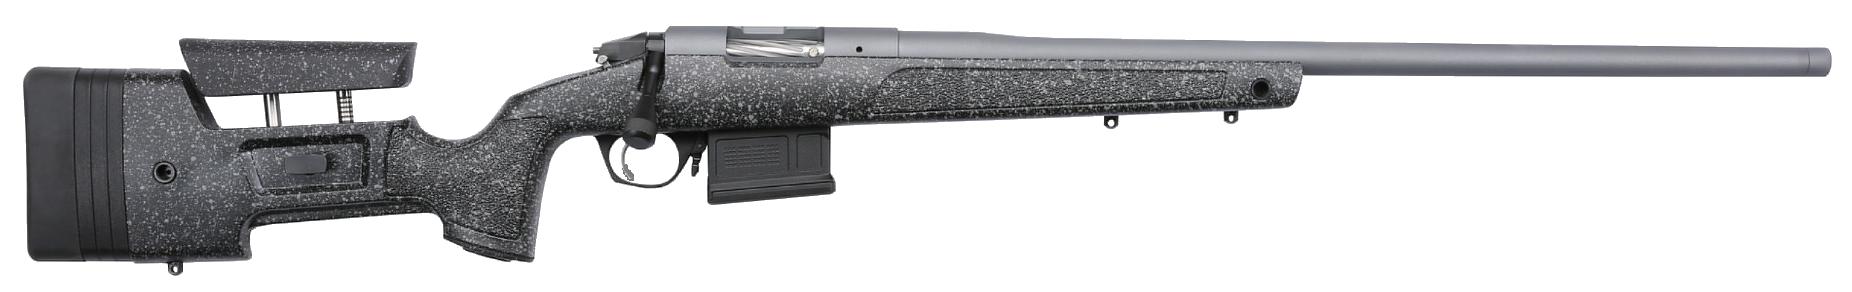 Bergara Rifles Premier HMR PRO